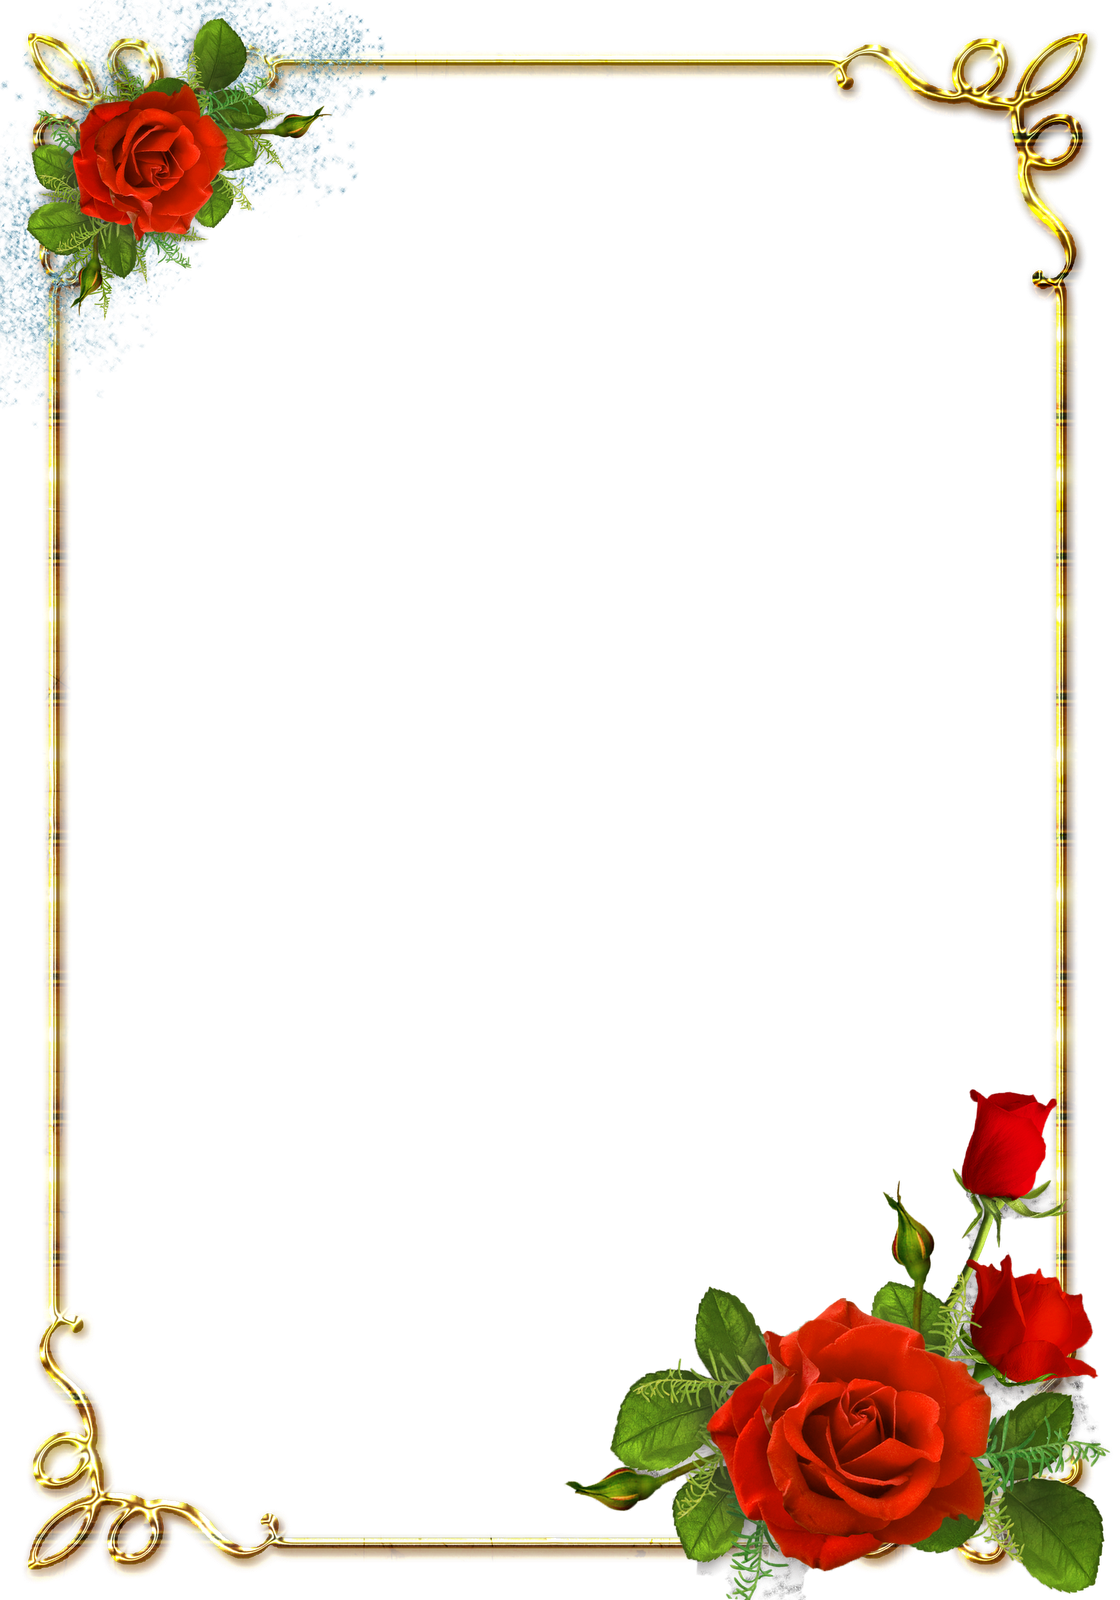 Pin de janaina moura em frames pinterest rosas for Drawing websites no download